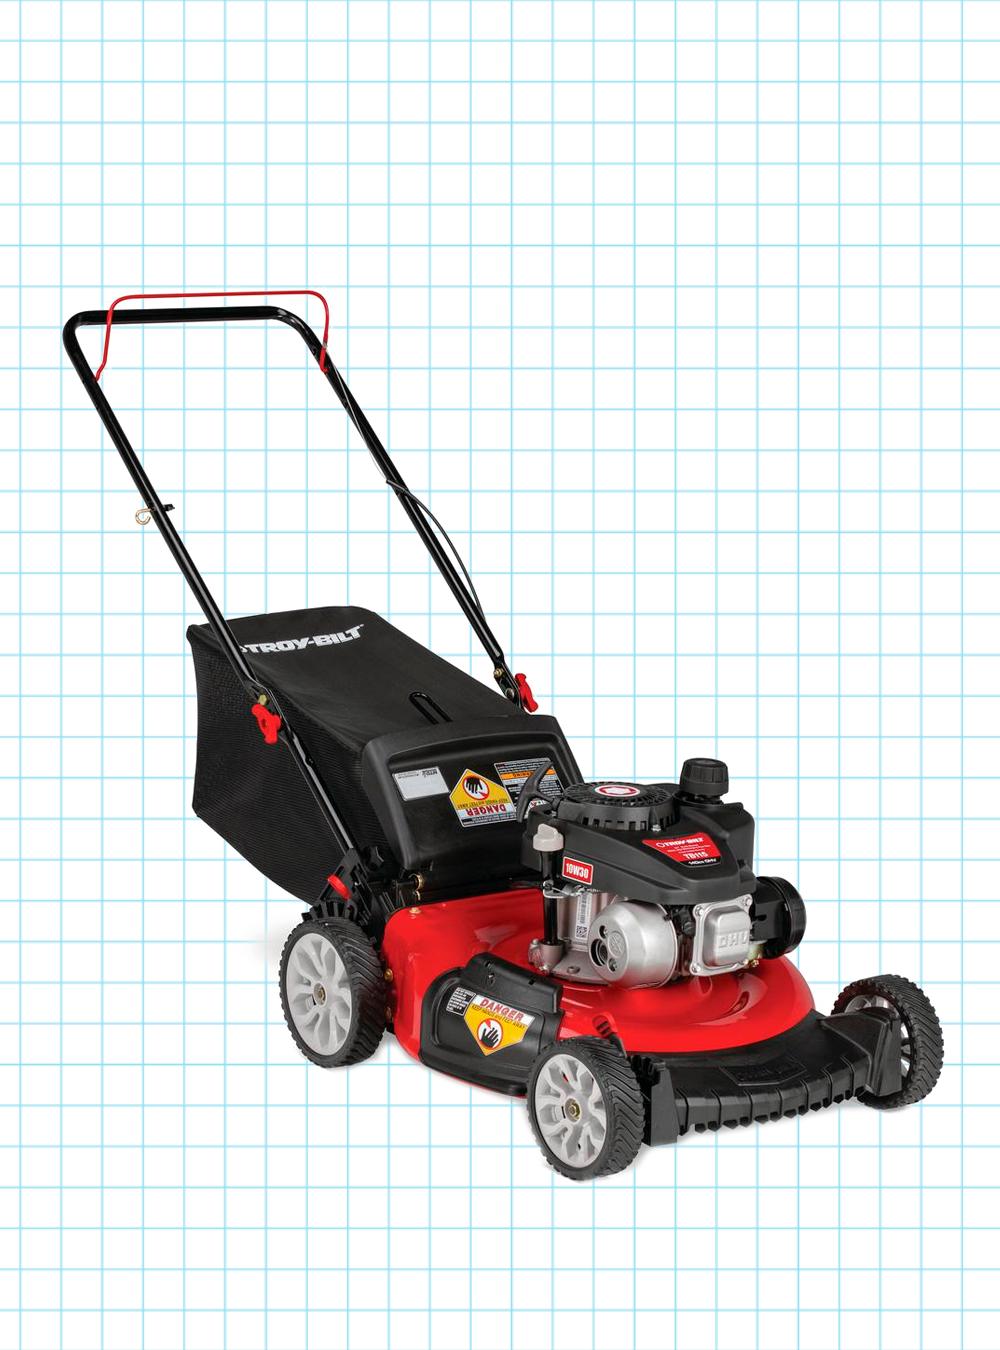 Troy-Bilt Gas Walk-Behind Push Mower with 3-in-1 TriAction Cutting System